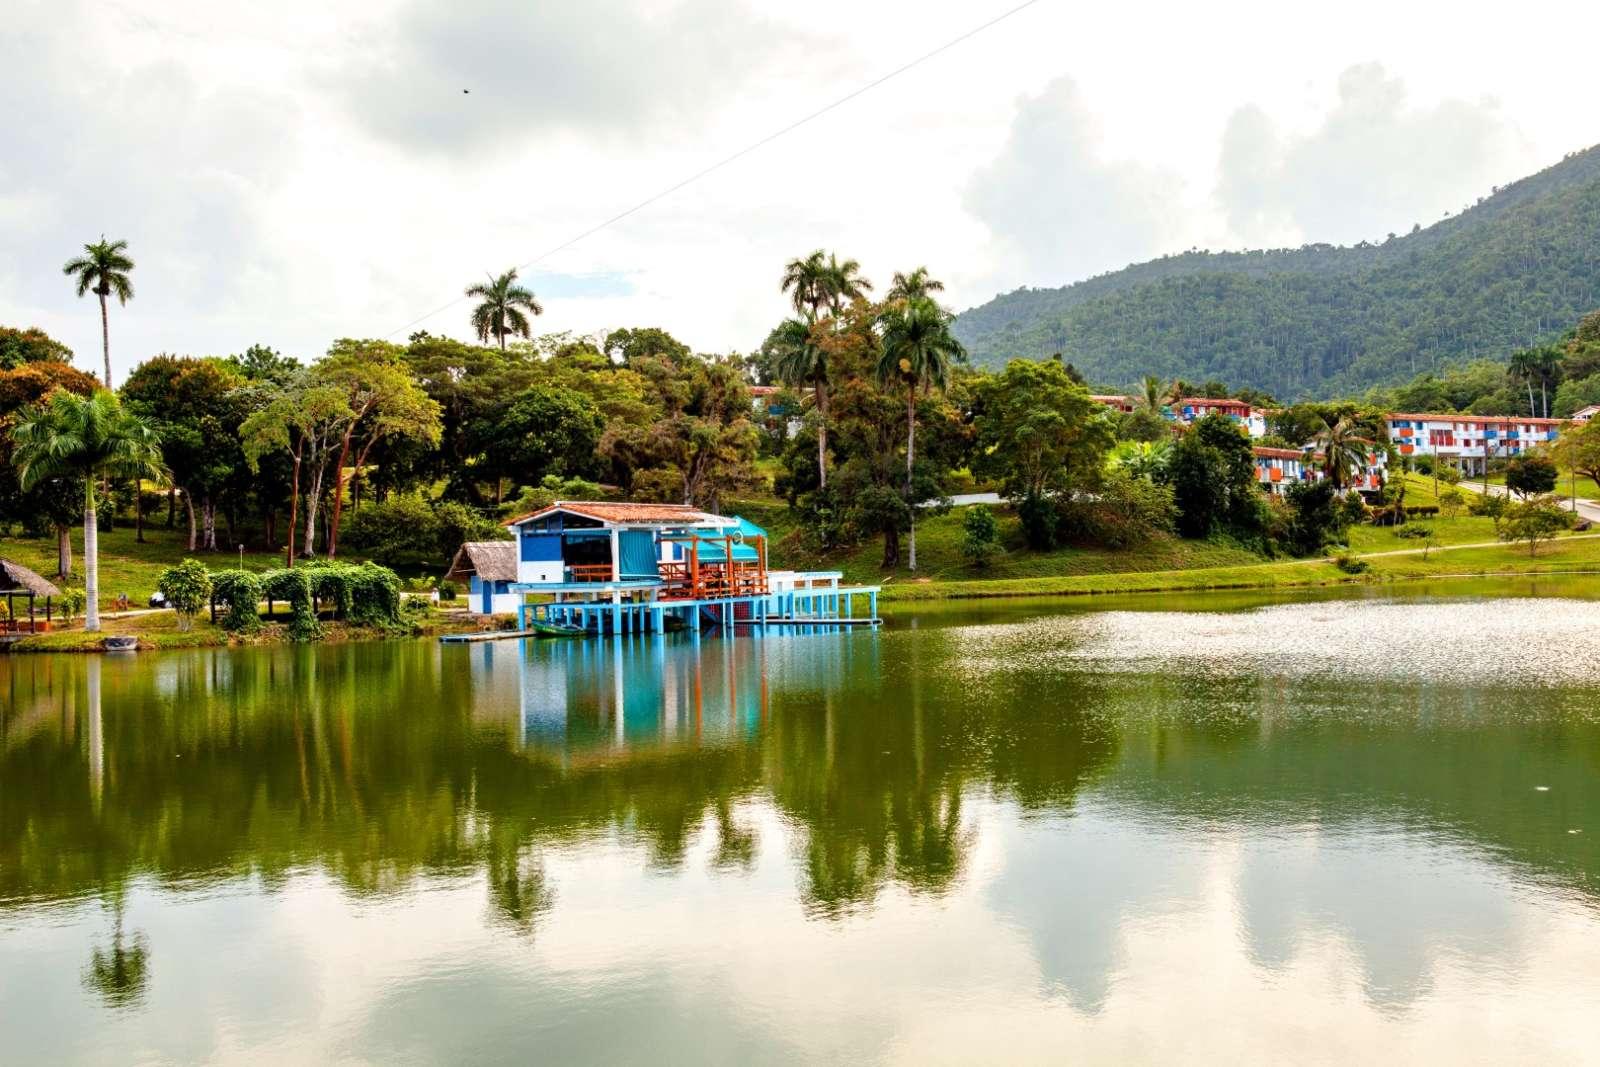 Boathouse at Las Terrazas, Cuba